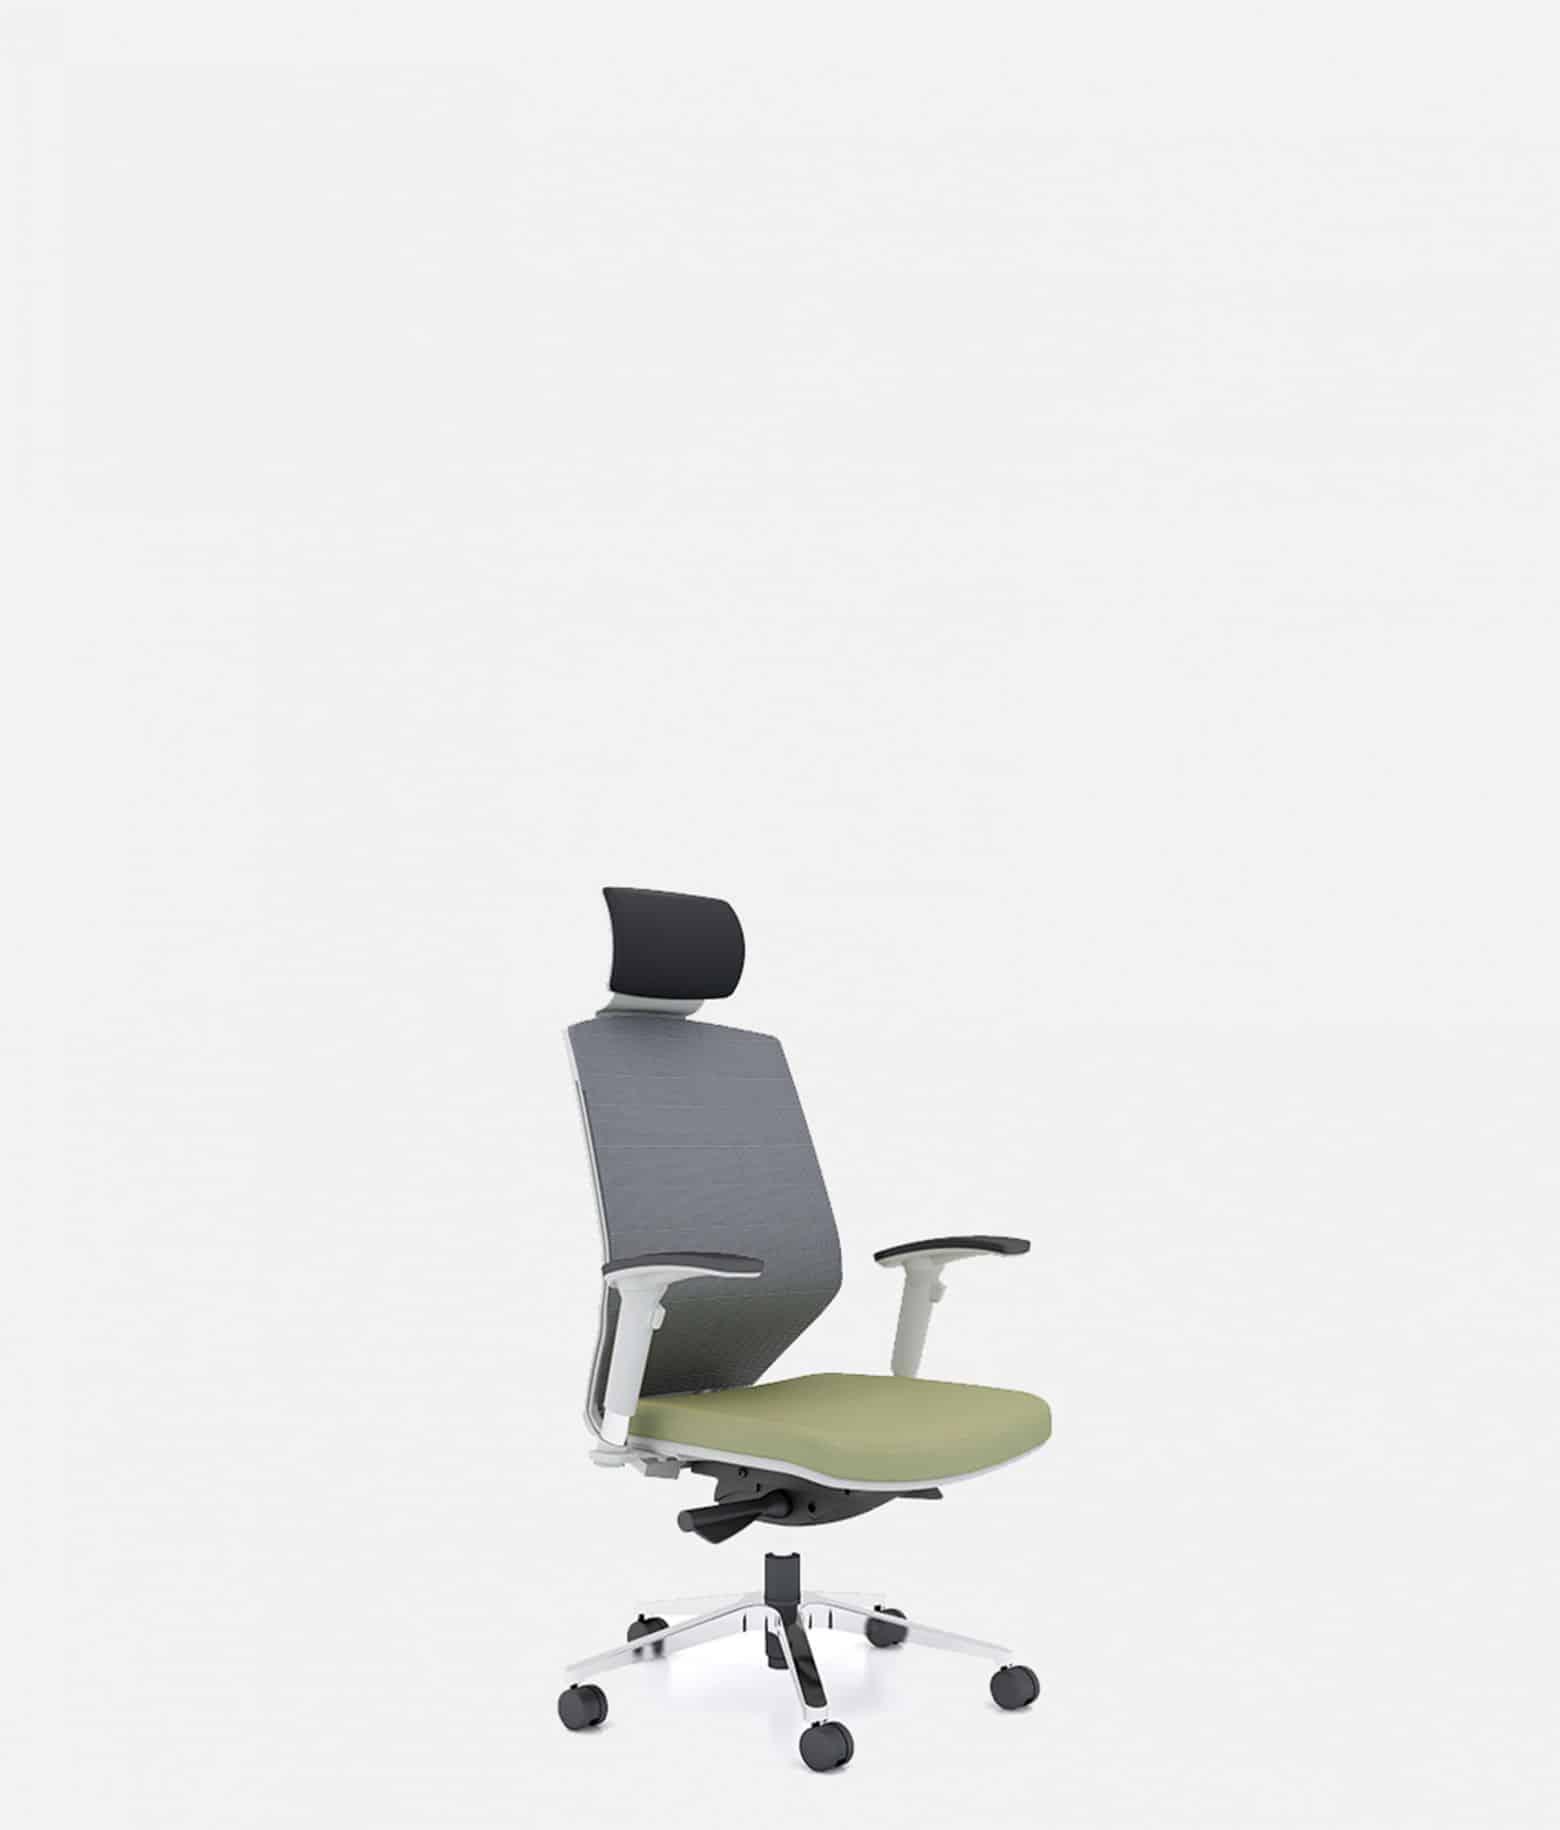 Vogue Task Chair m